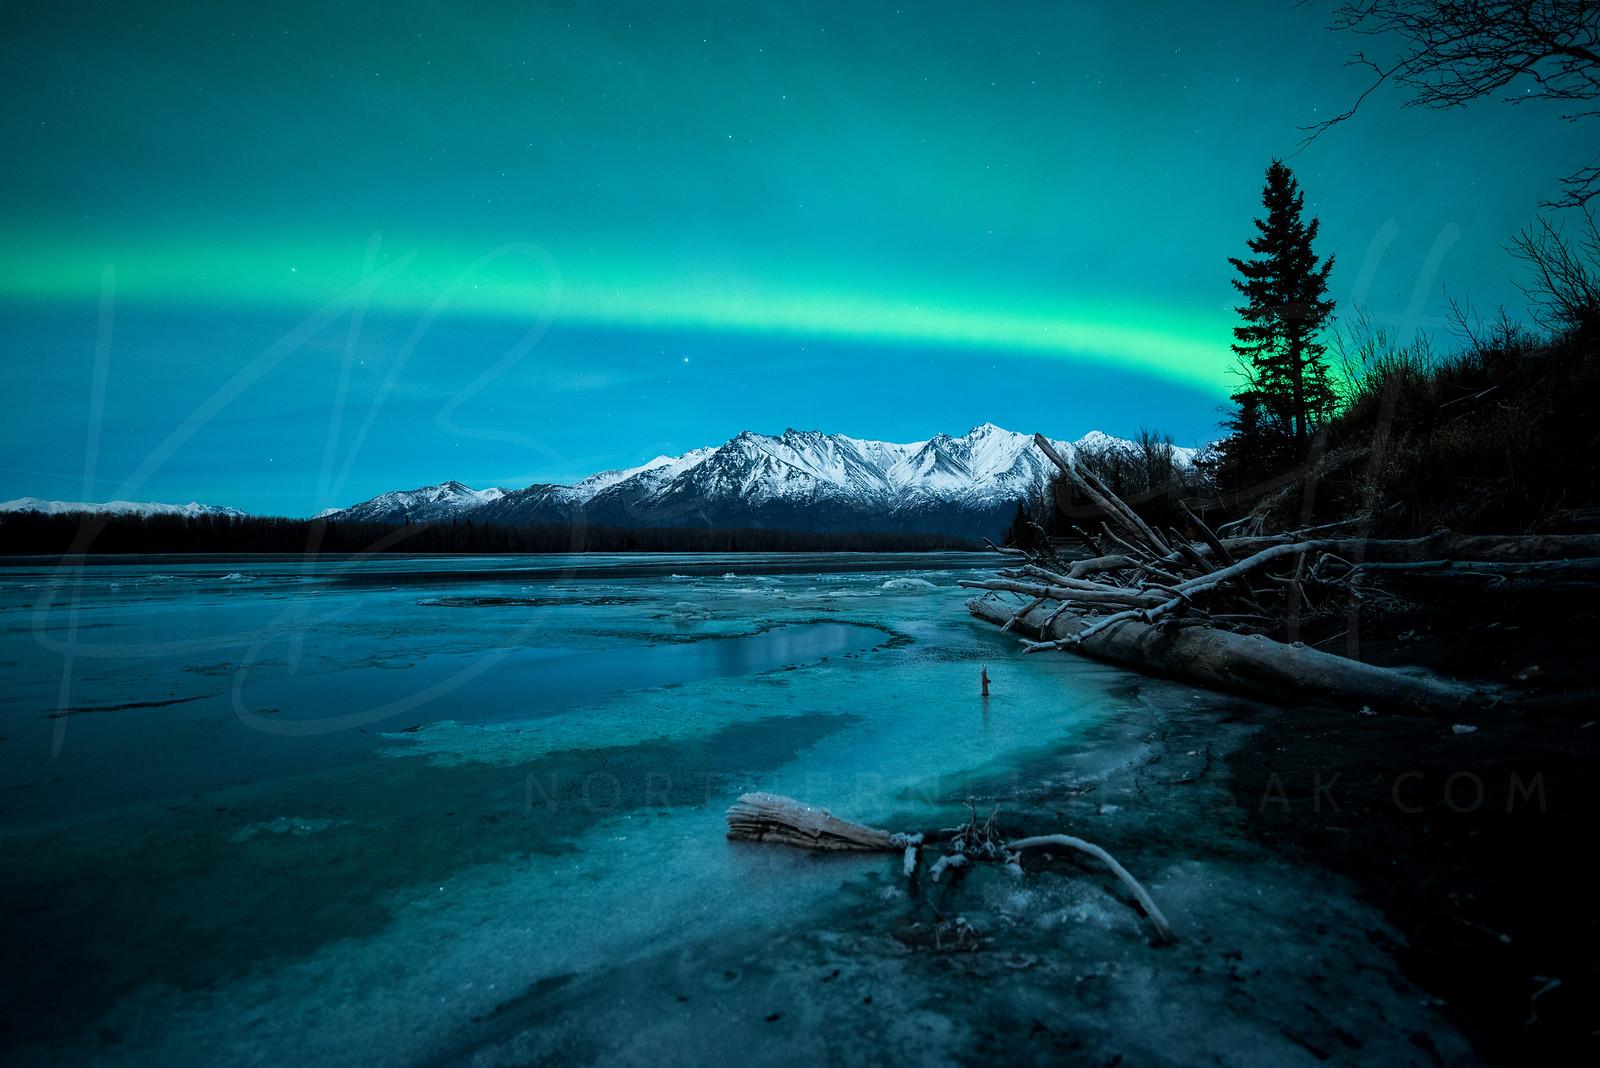 #Aurora covers the #mountains in #Palmer, AK - P/@kbdesignphoto